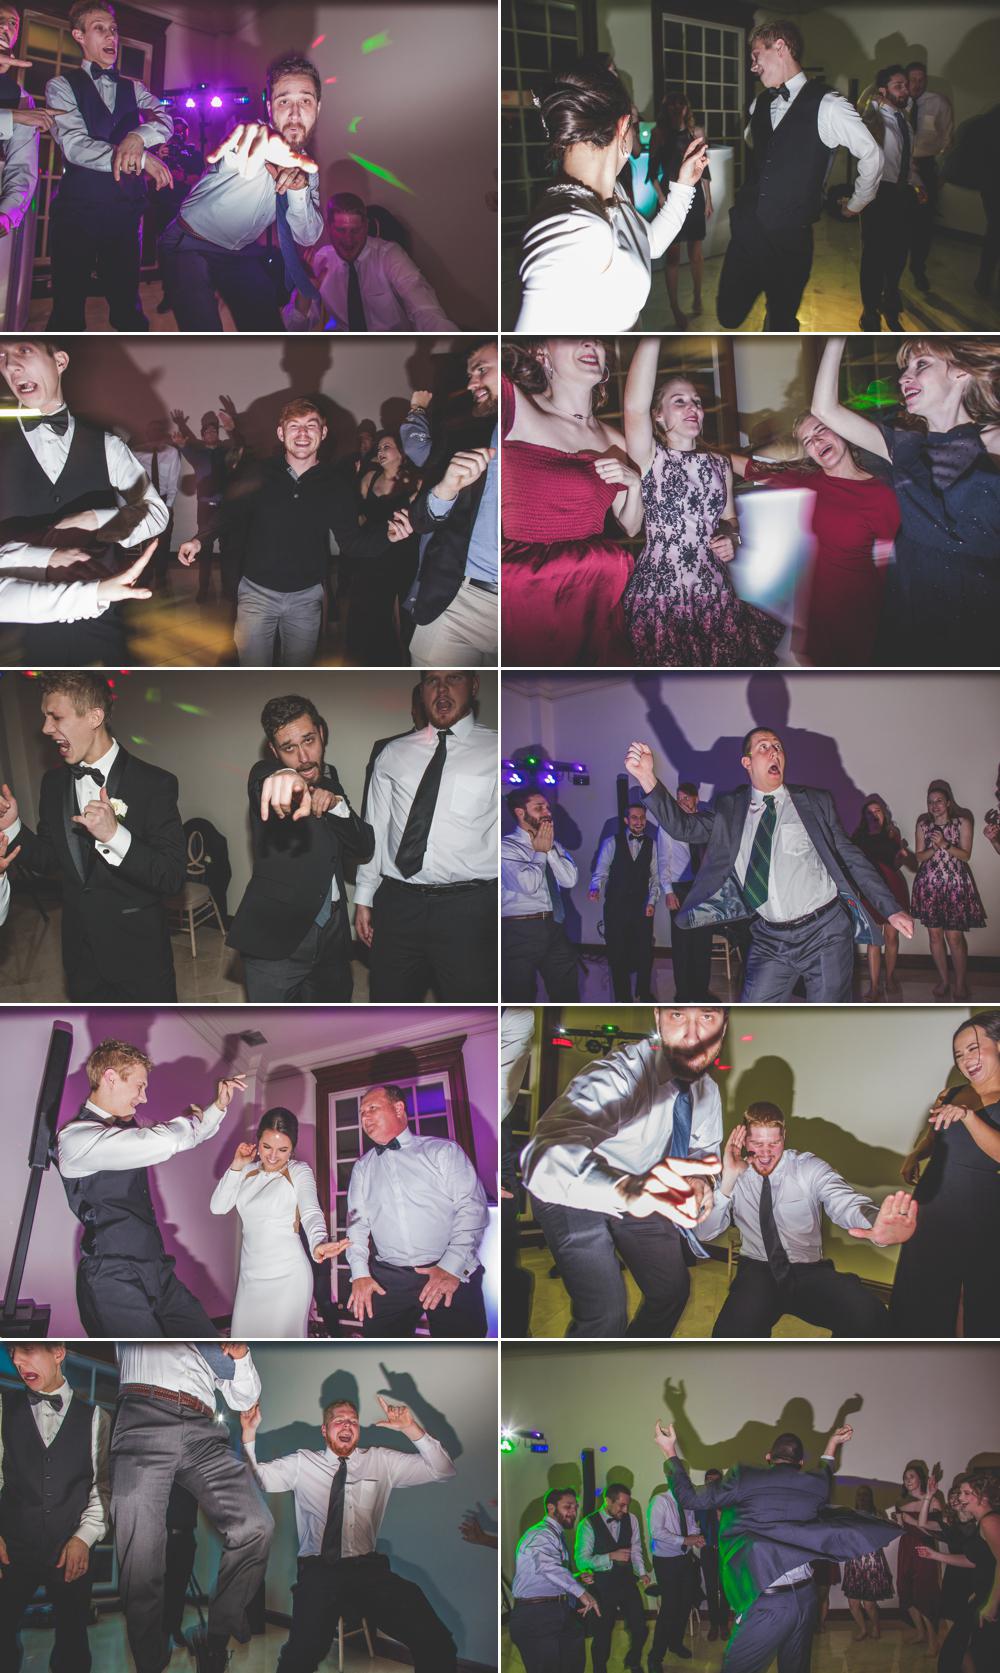 kansas-city-club-kansas-city-wedding-photographer-jason-domingues-photography-natalie-wesley-blog-0066.jpg